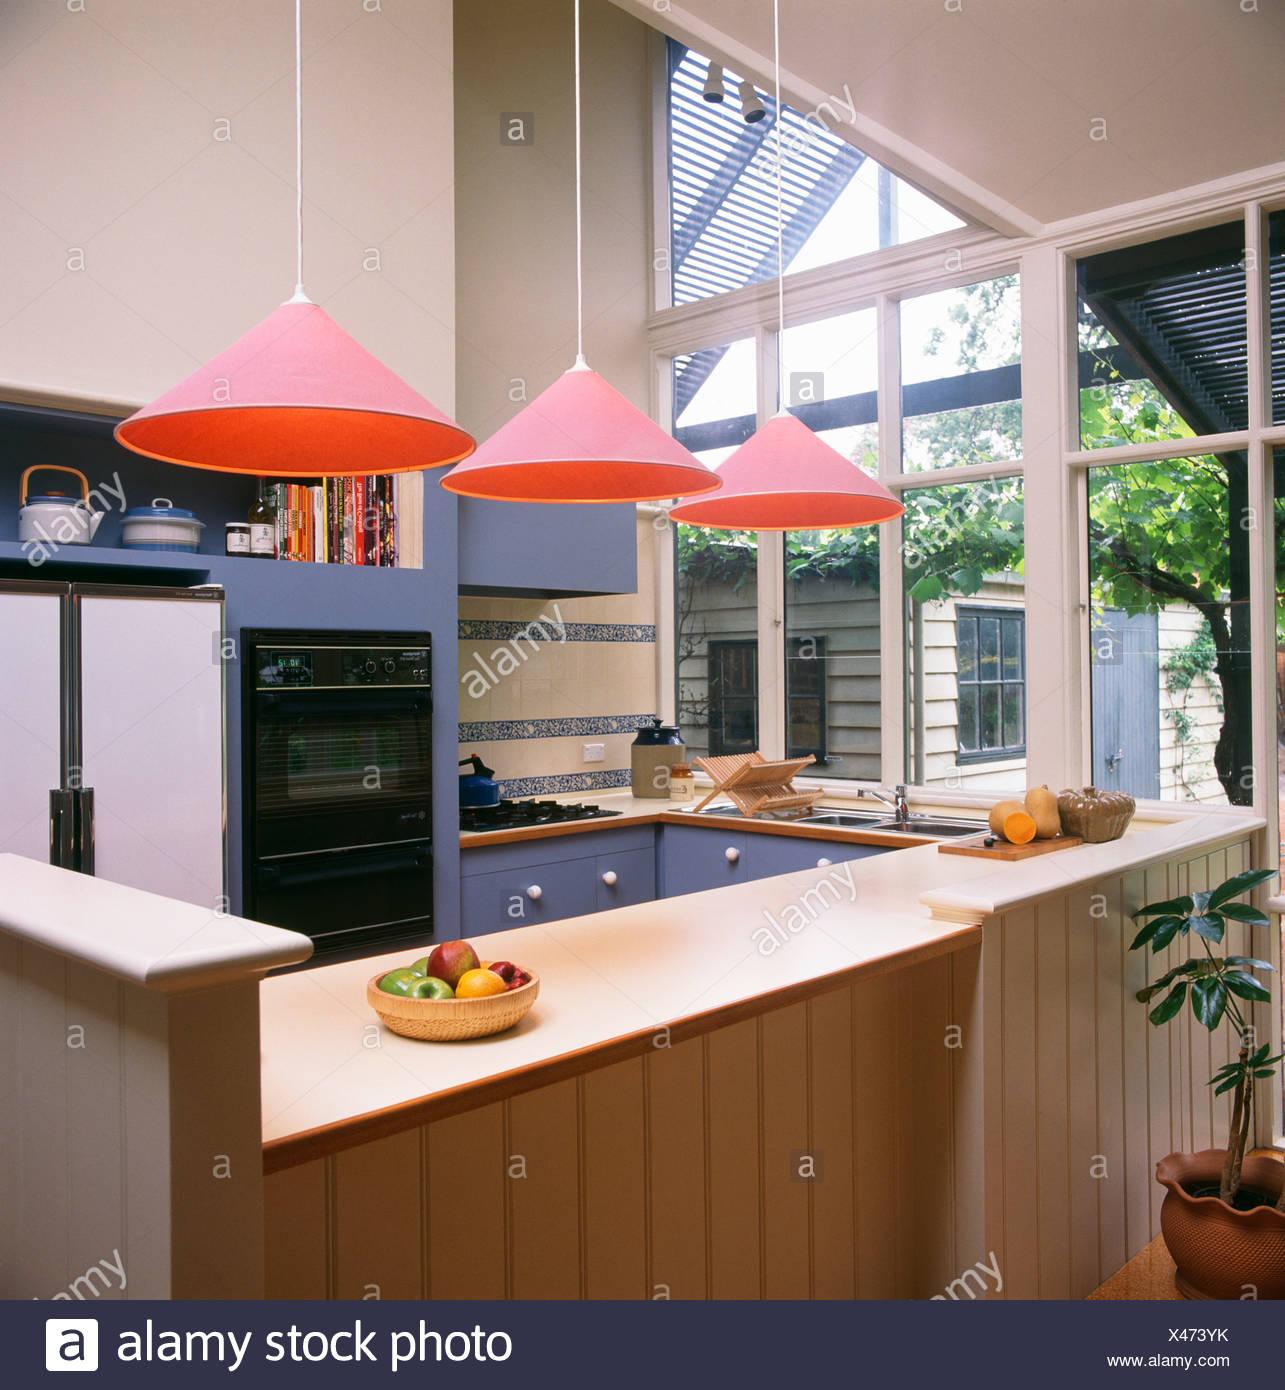 Kitchen Peninsular Stock Photos & Kitchen Peninsular Stock